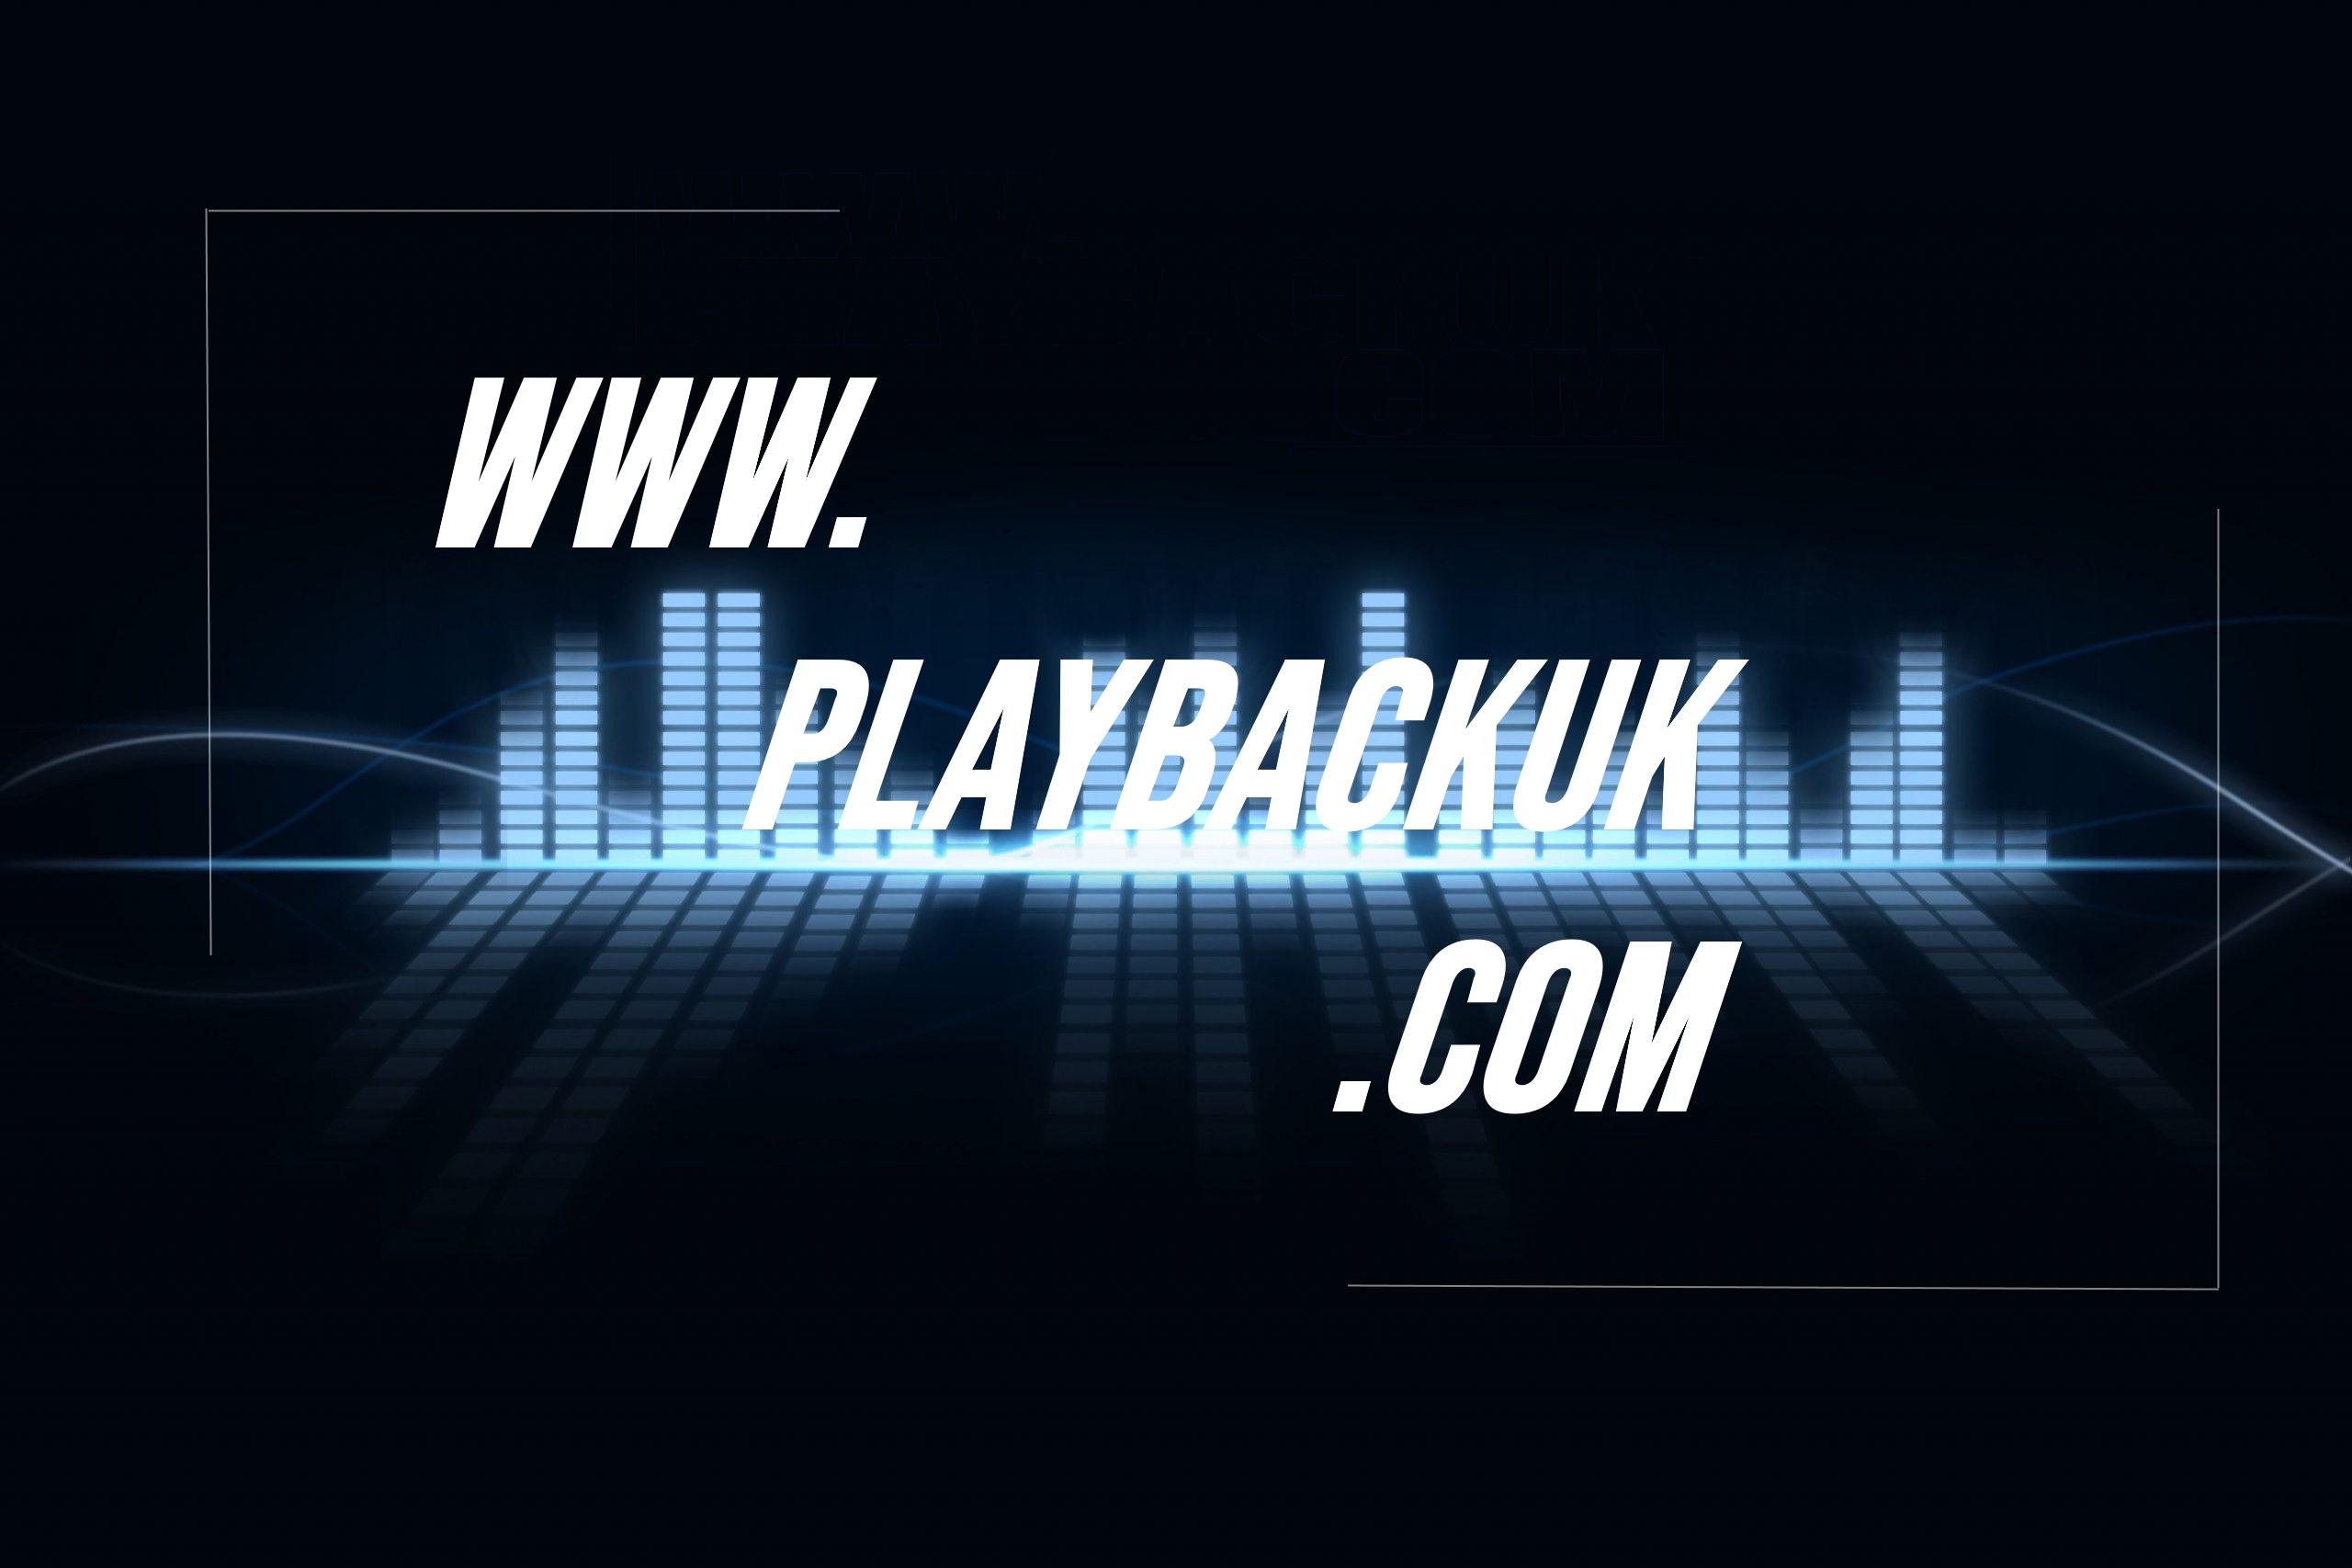 PLAYBACKUK.COM LIVE!!